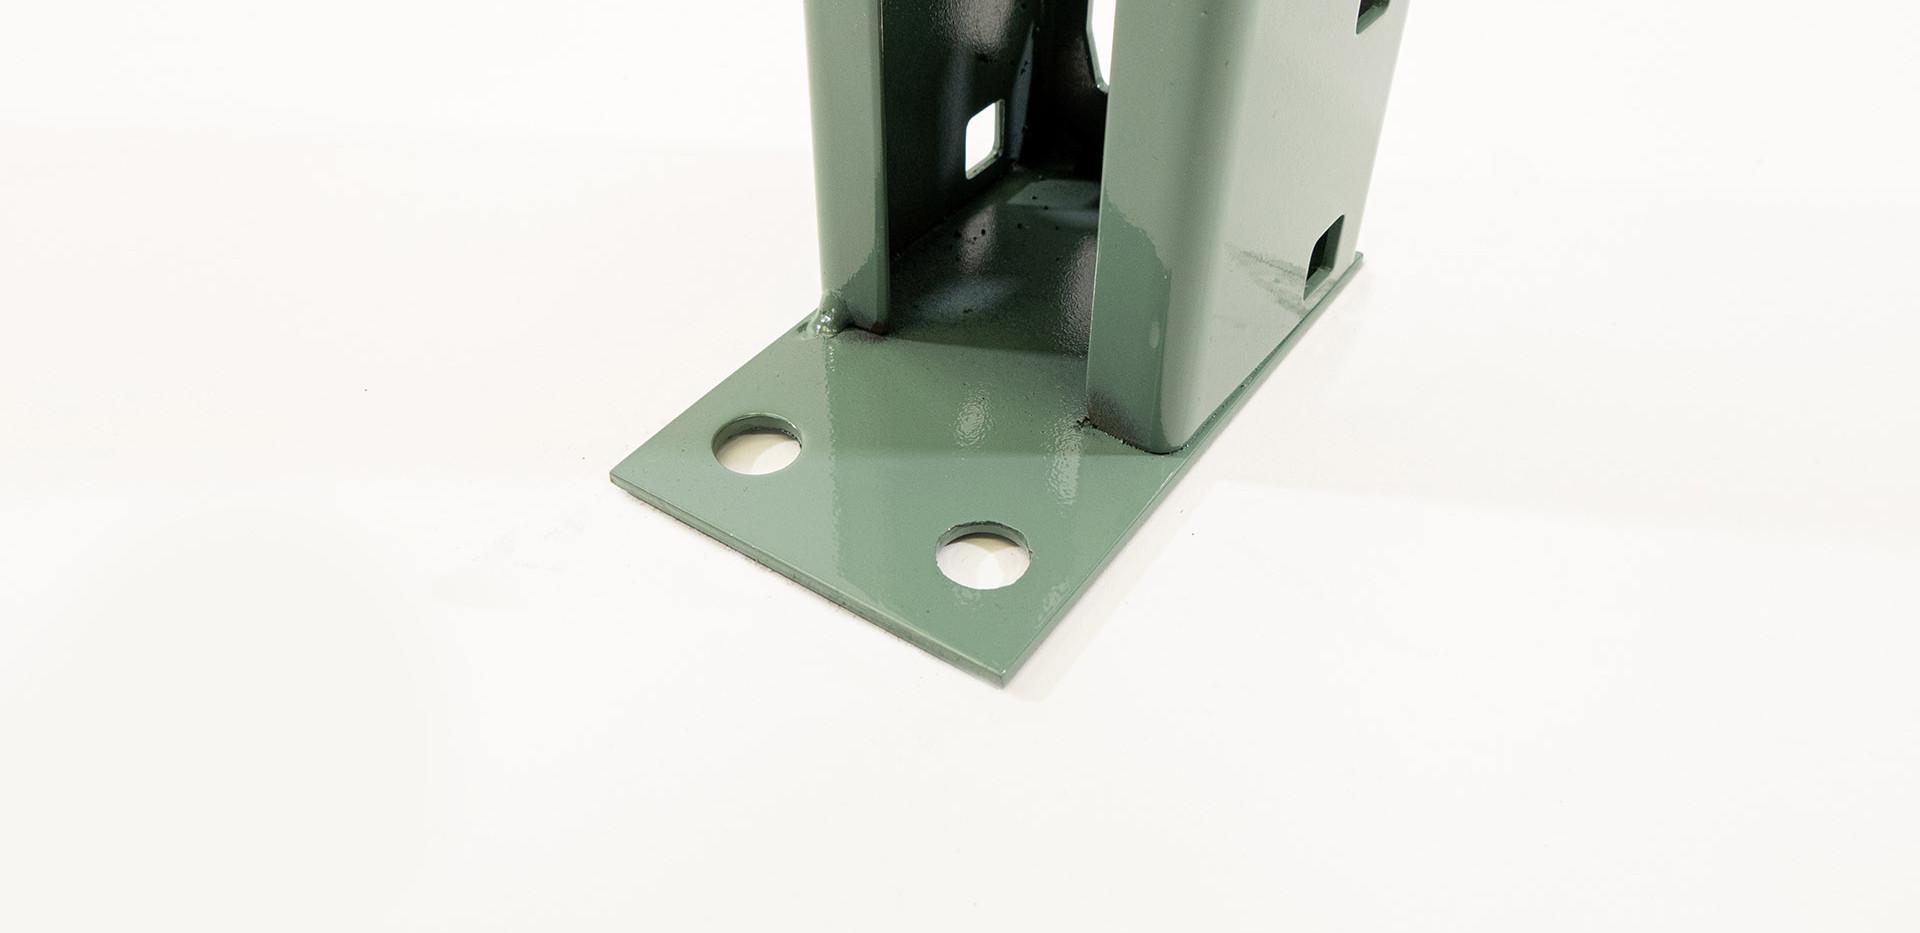 Advantage Pallet Rack Repair Internal Reinforced